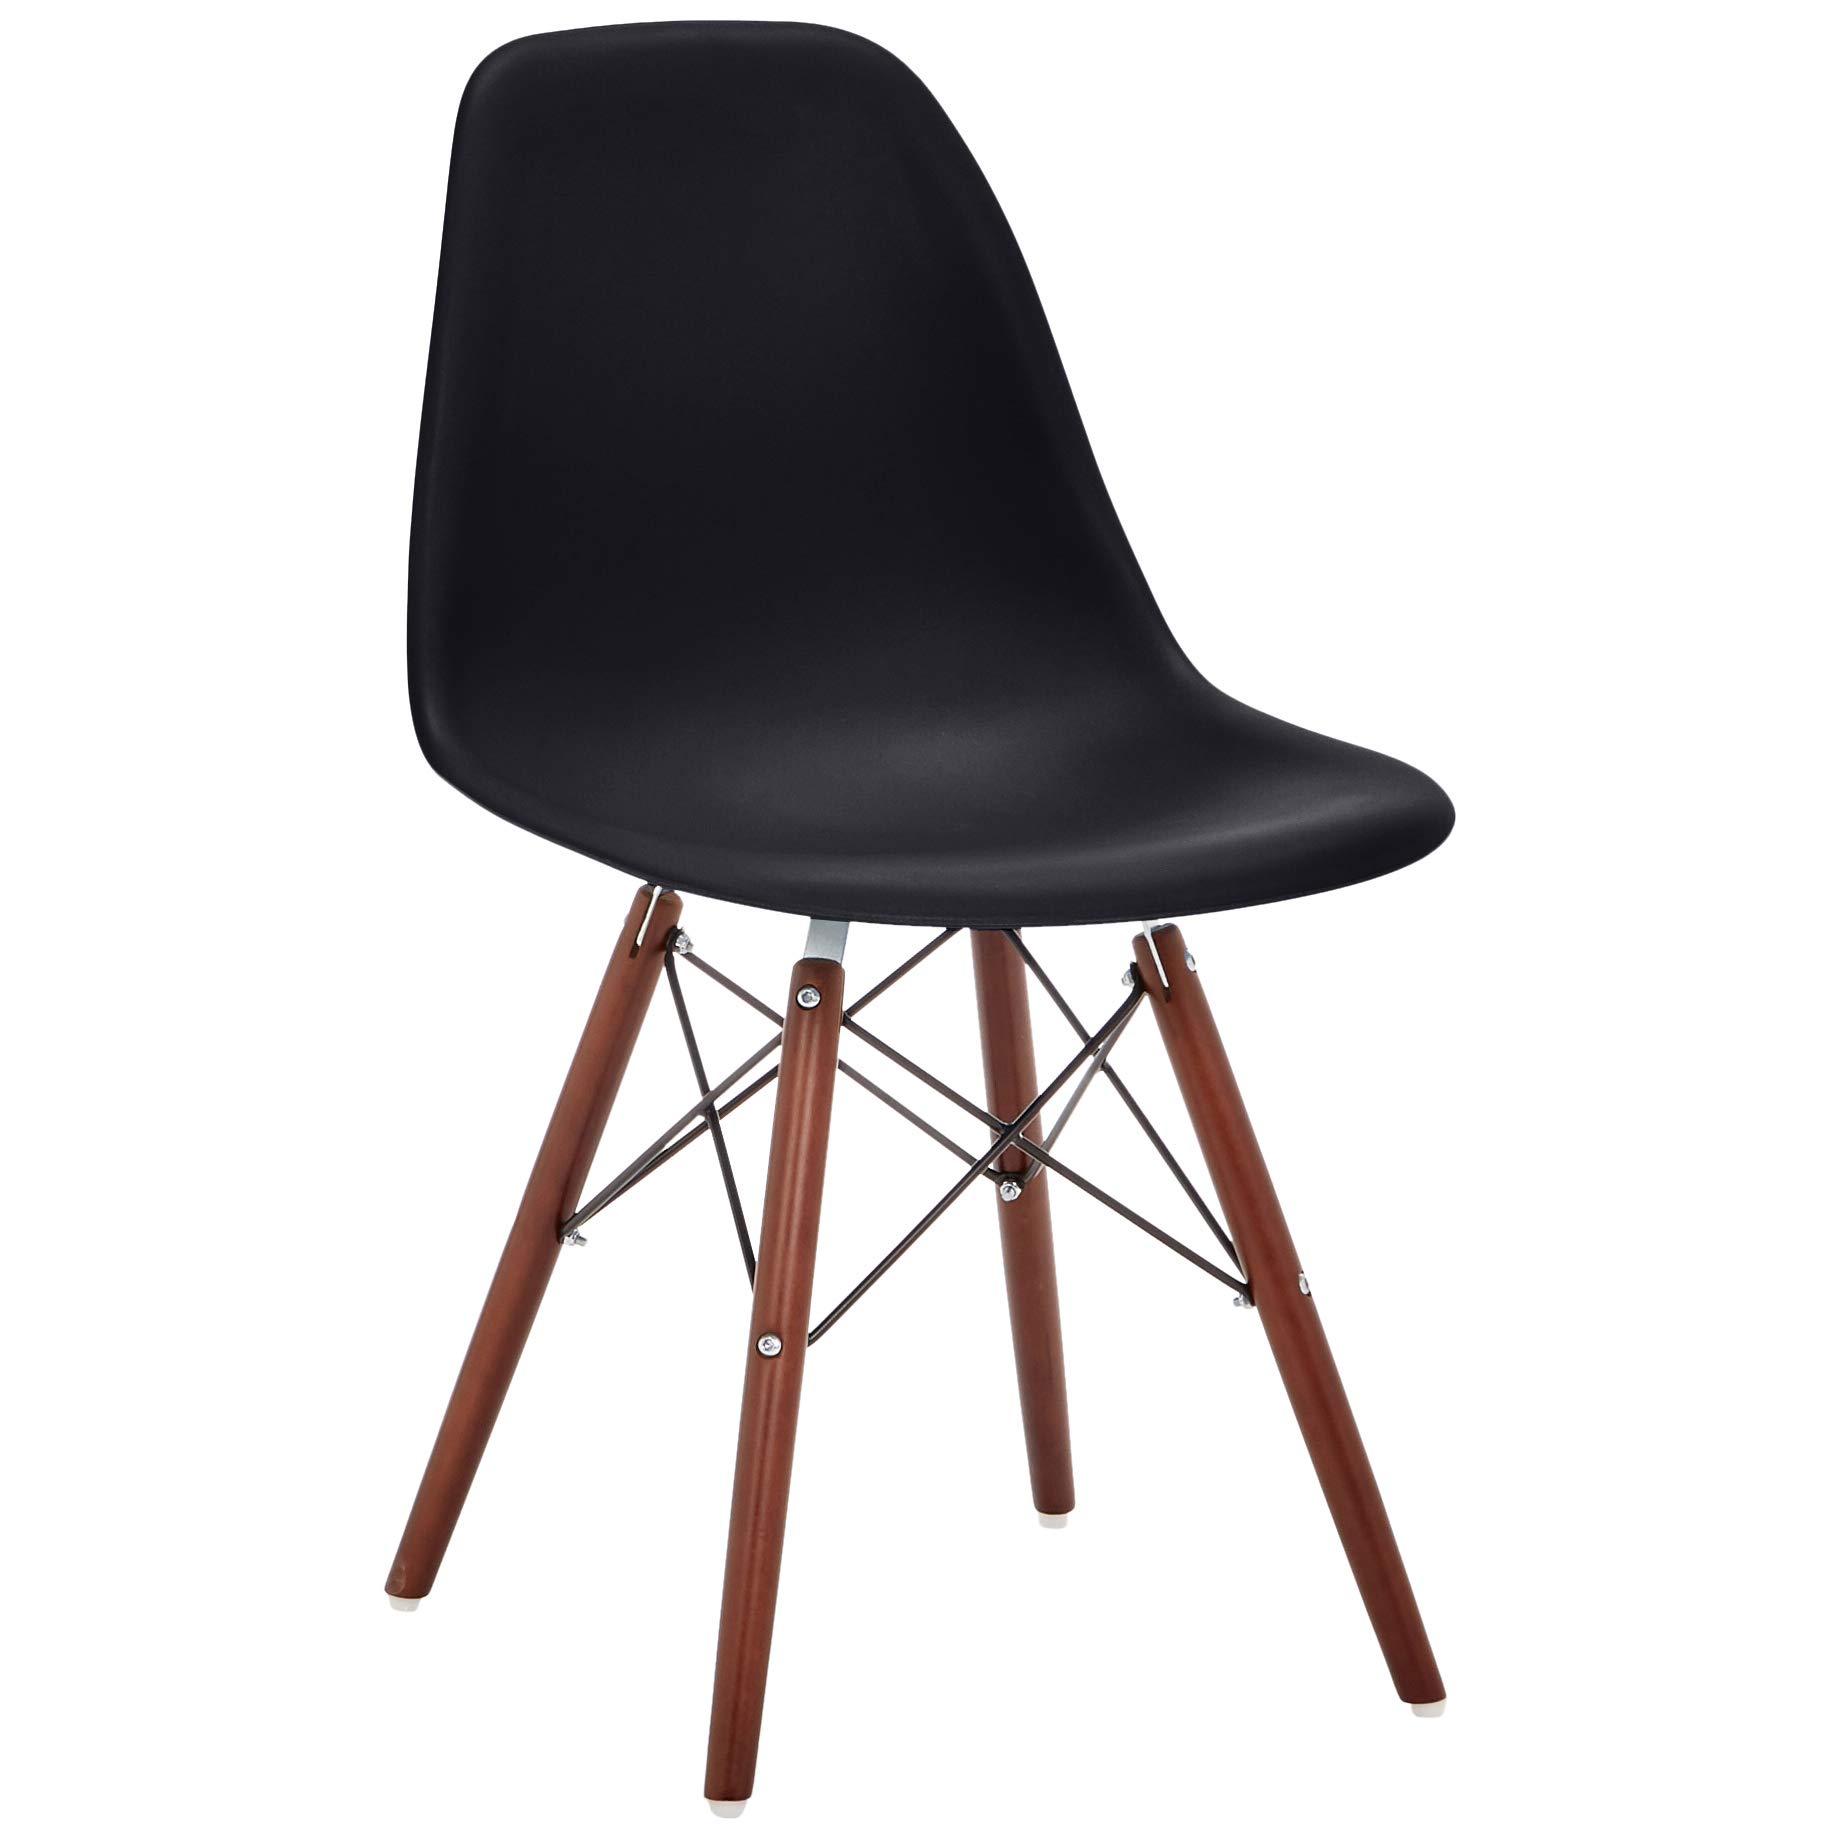 Phoenix Home AVH072001 Dining Chair, 21'' Length x 18.5'' Width x 32.5'' Height, Black